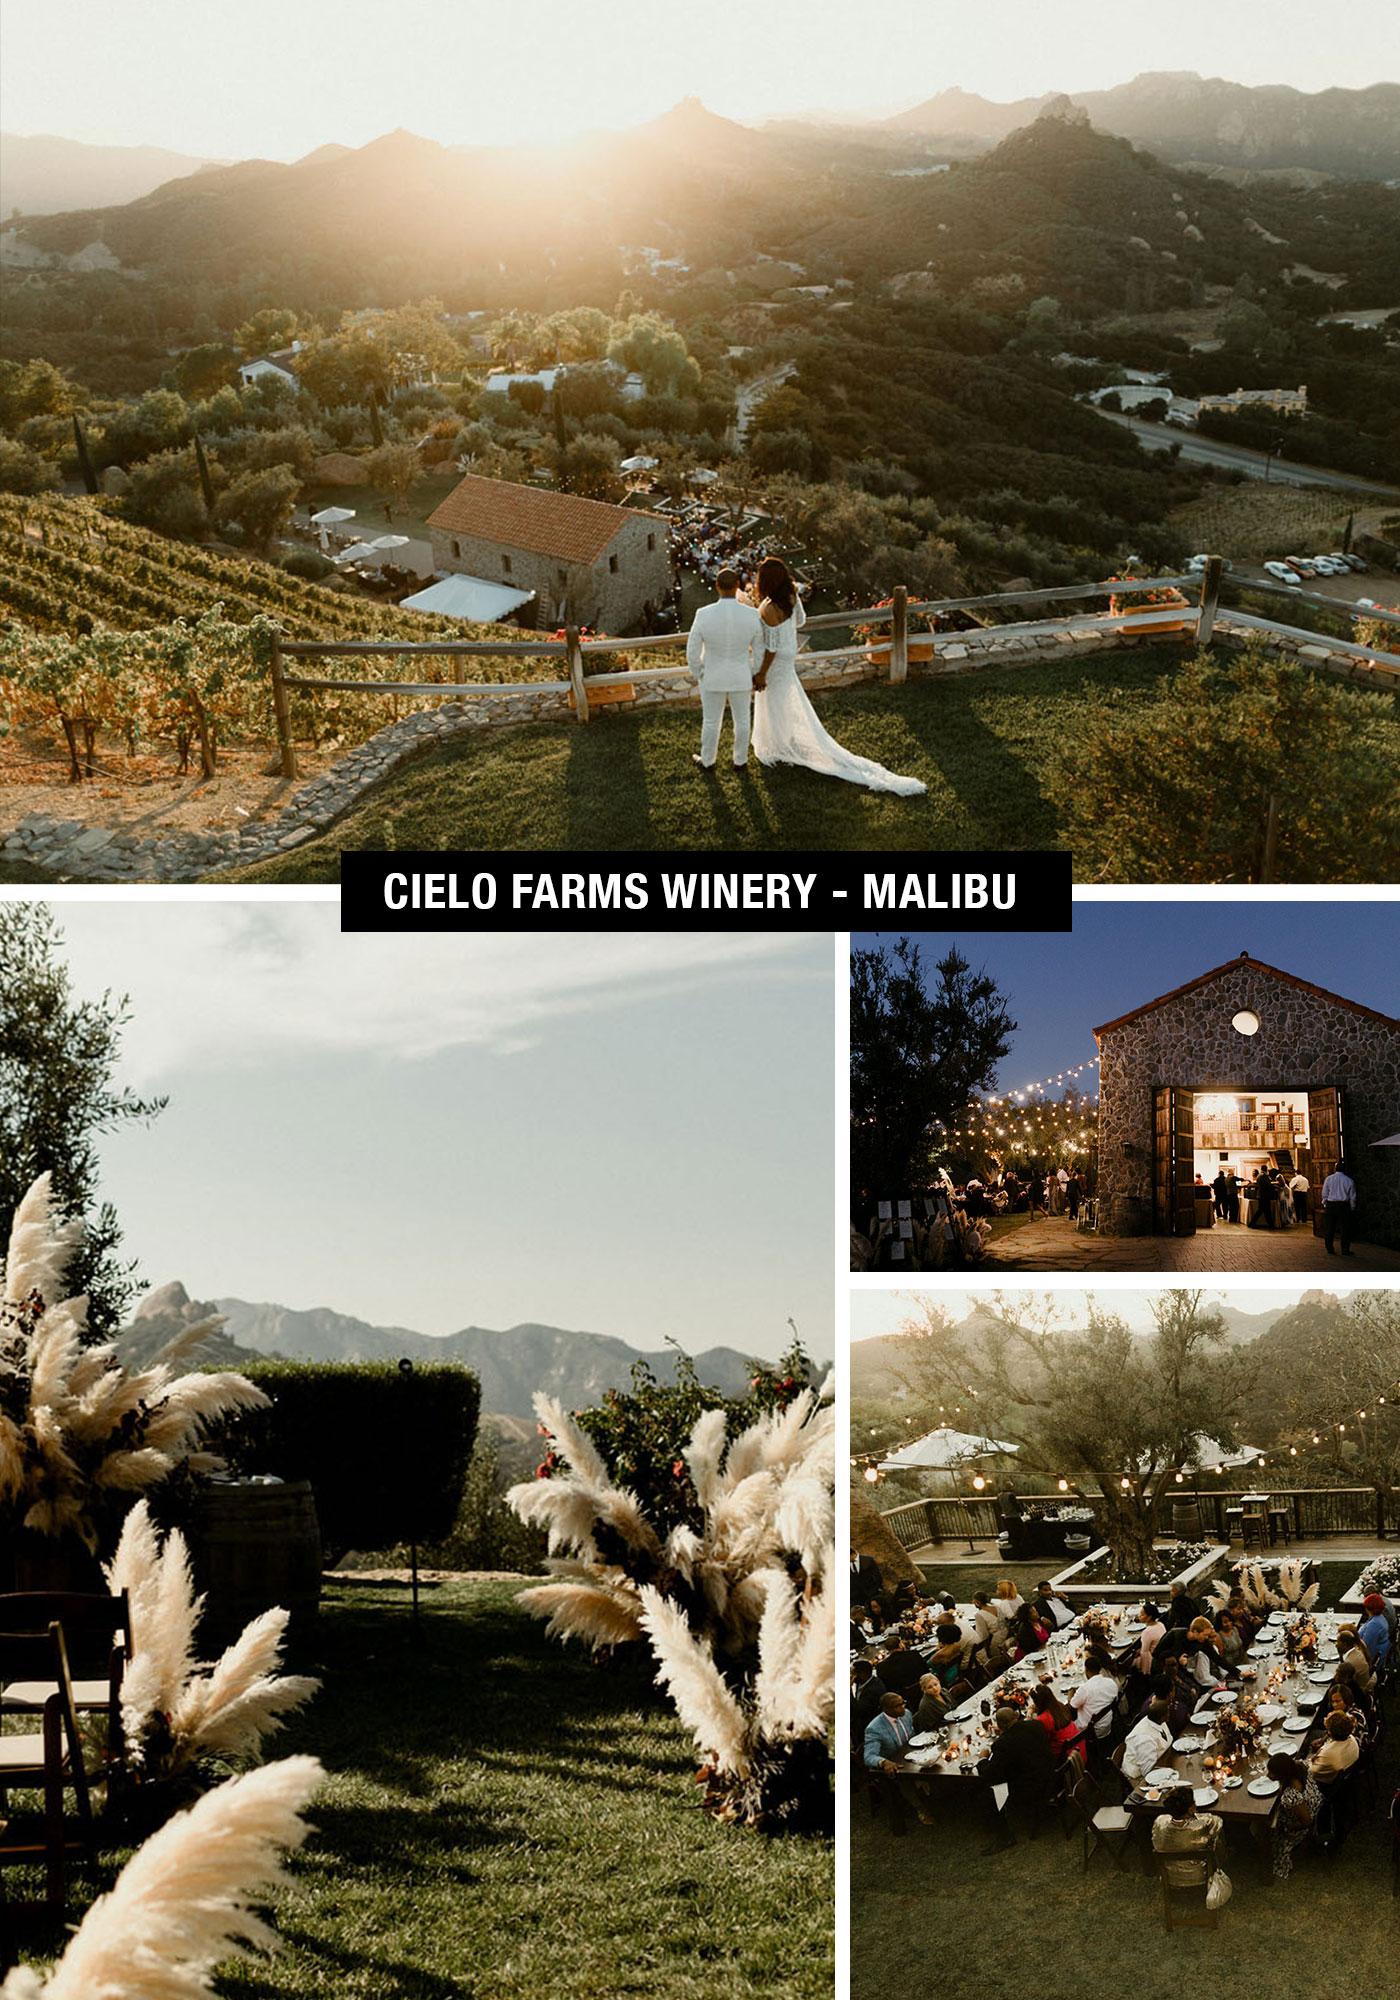 Cielo Farms Winery Malibu